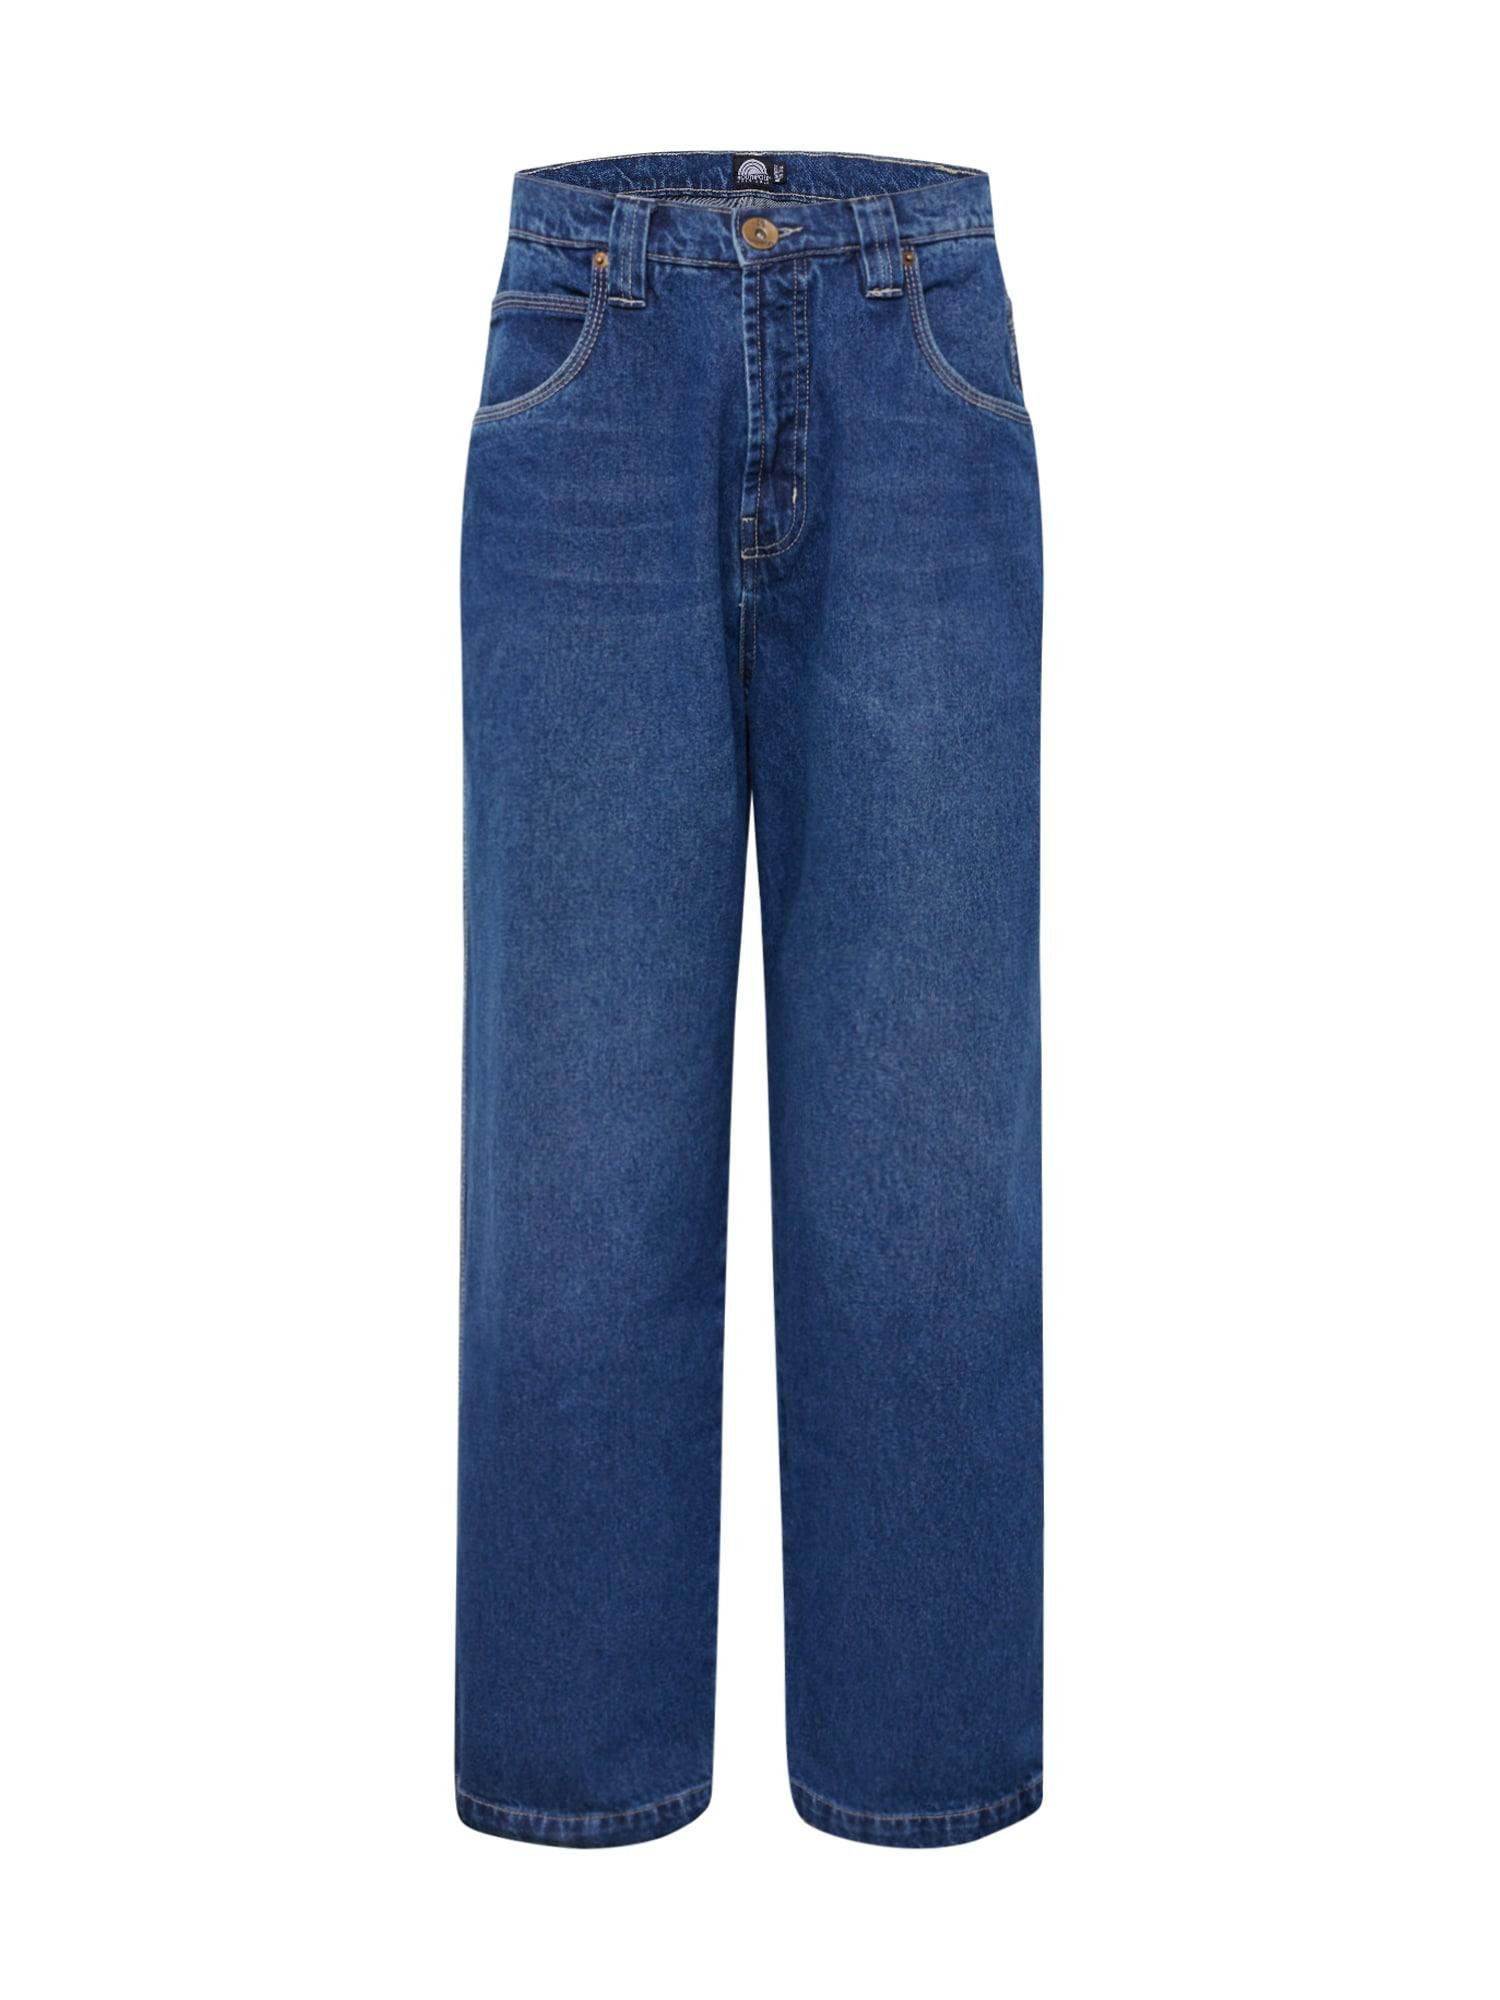 SOUTHPOLE Džinsai tamsiai (džinso) mėlyna